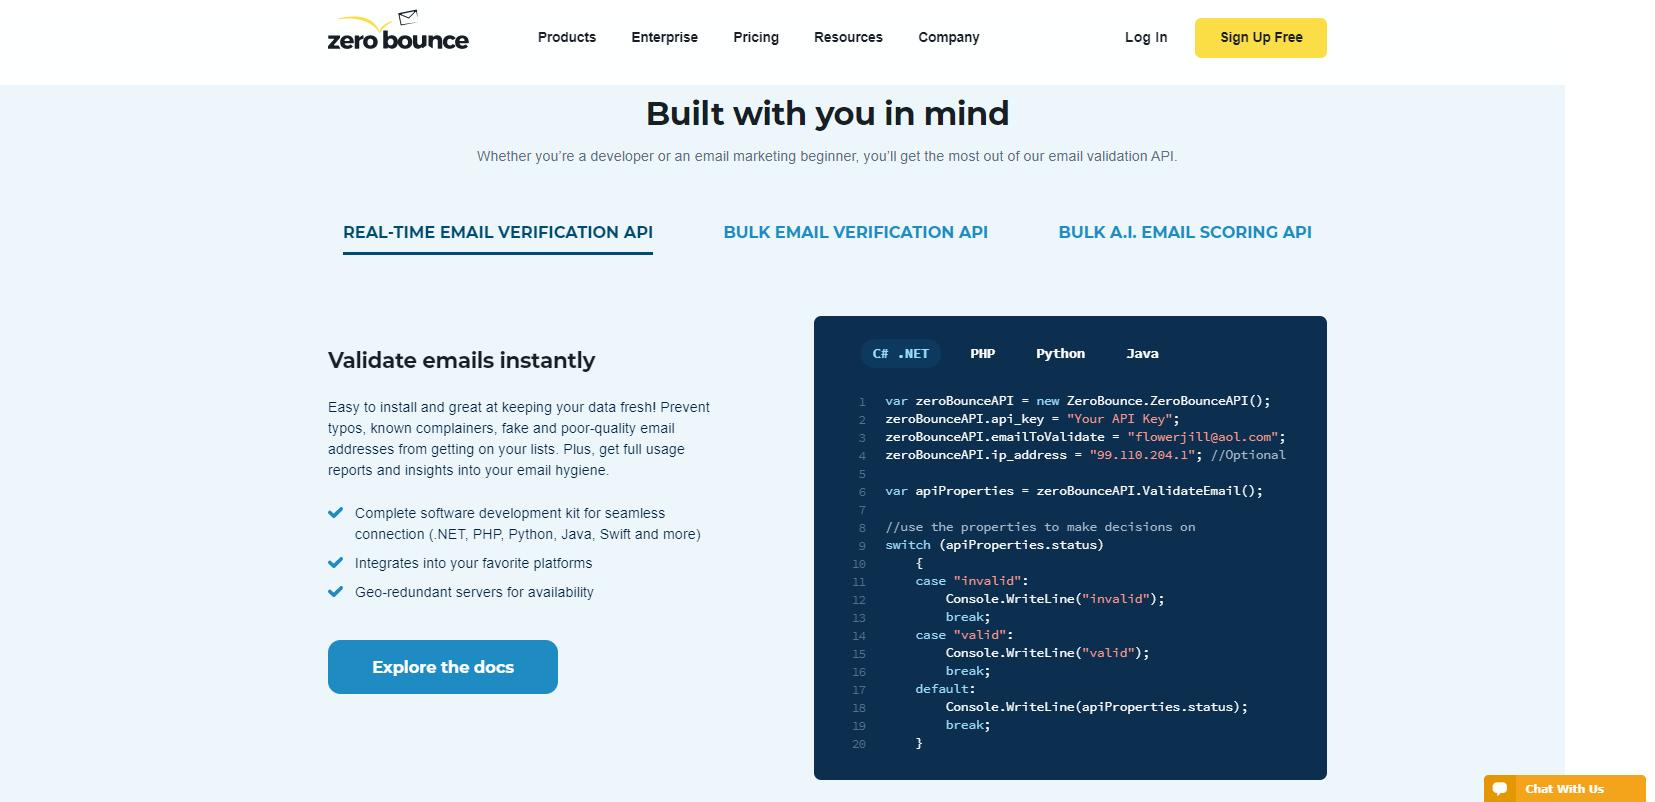 ZeroBounce API